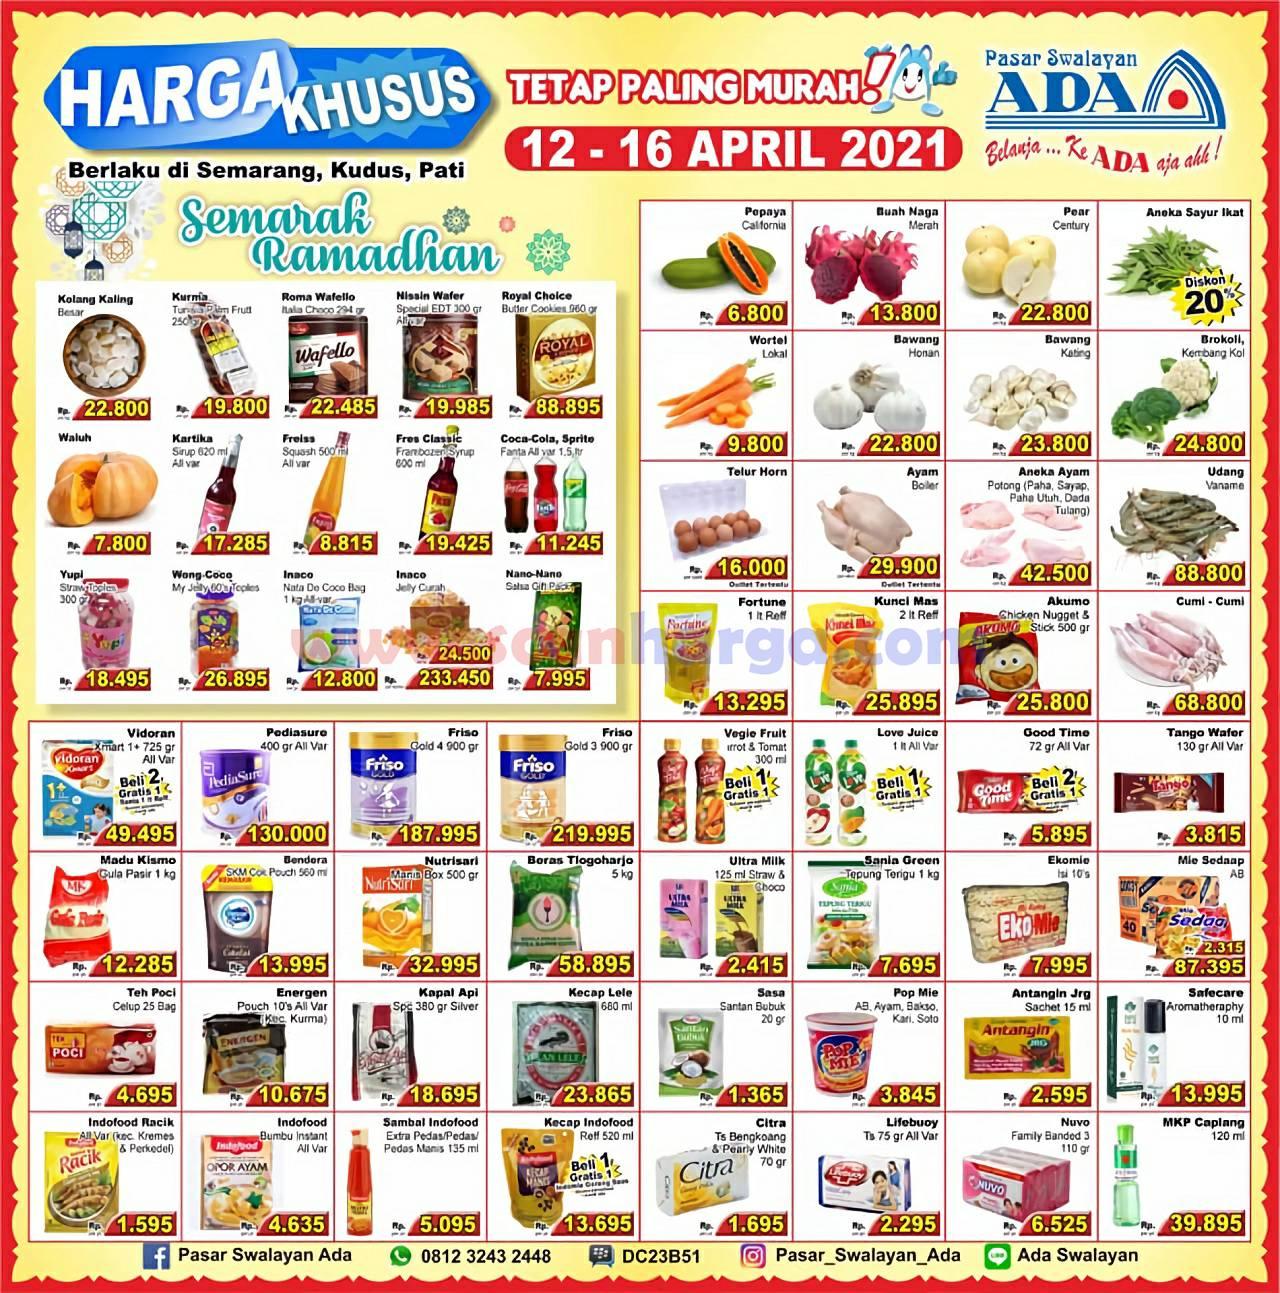 Promo Katalog Ada Swalayan Weekday Harga Khusus 12 - 16 April 2021